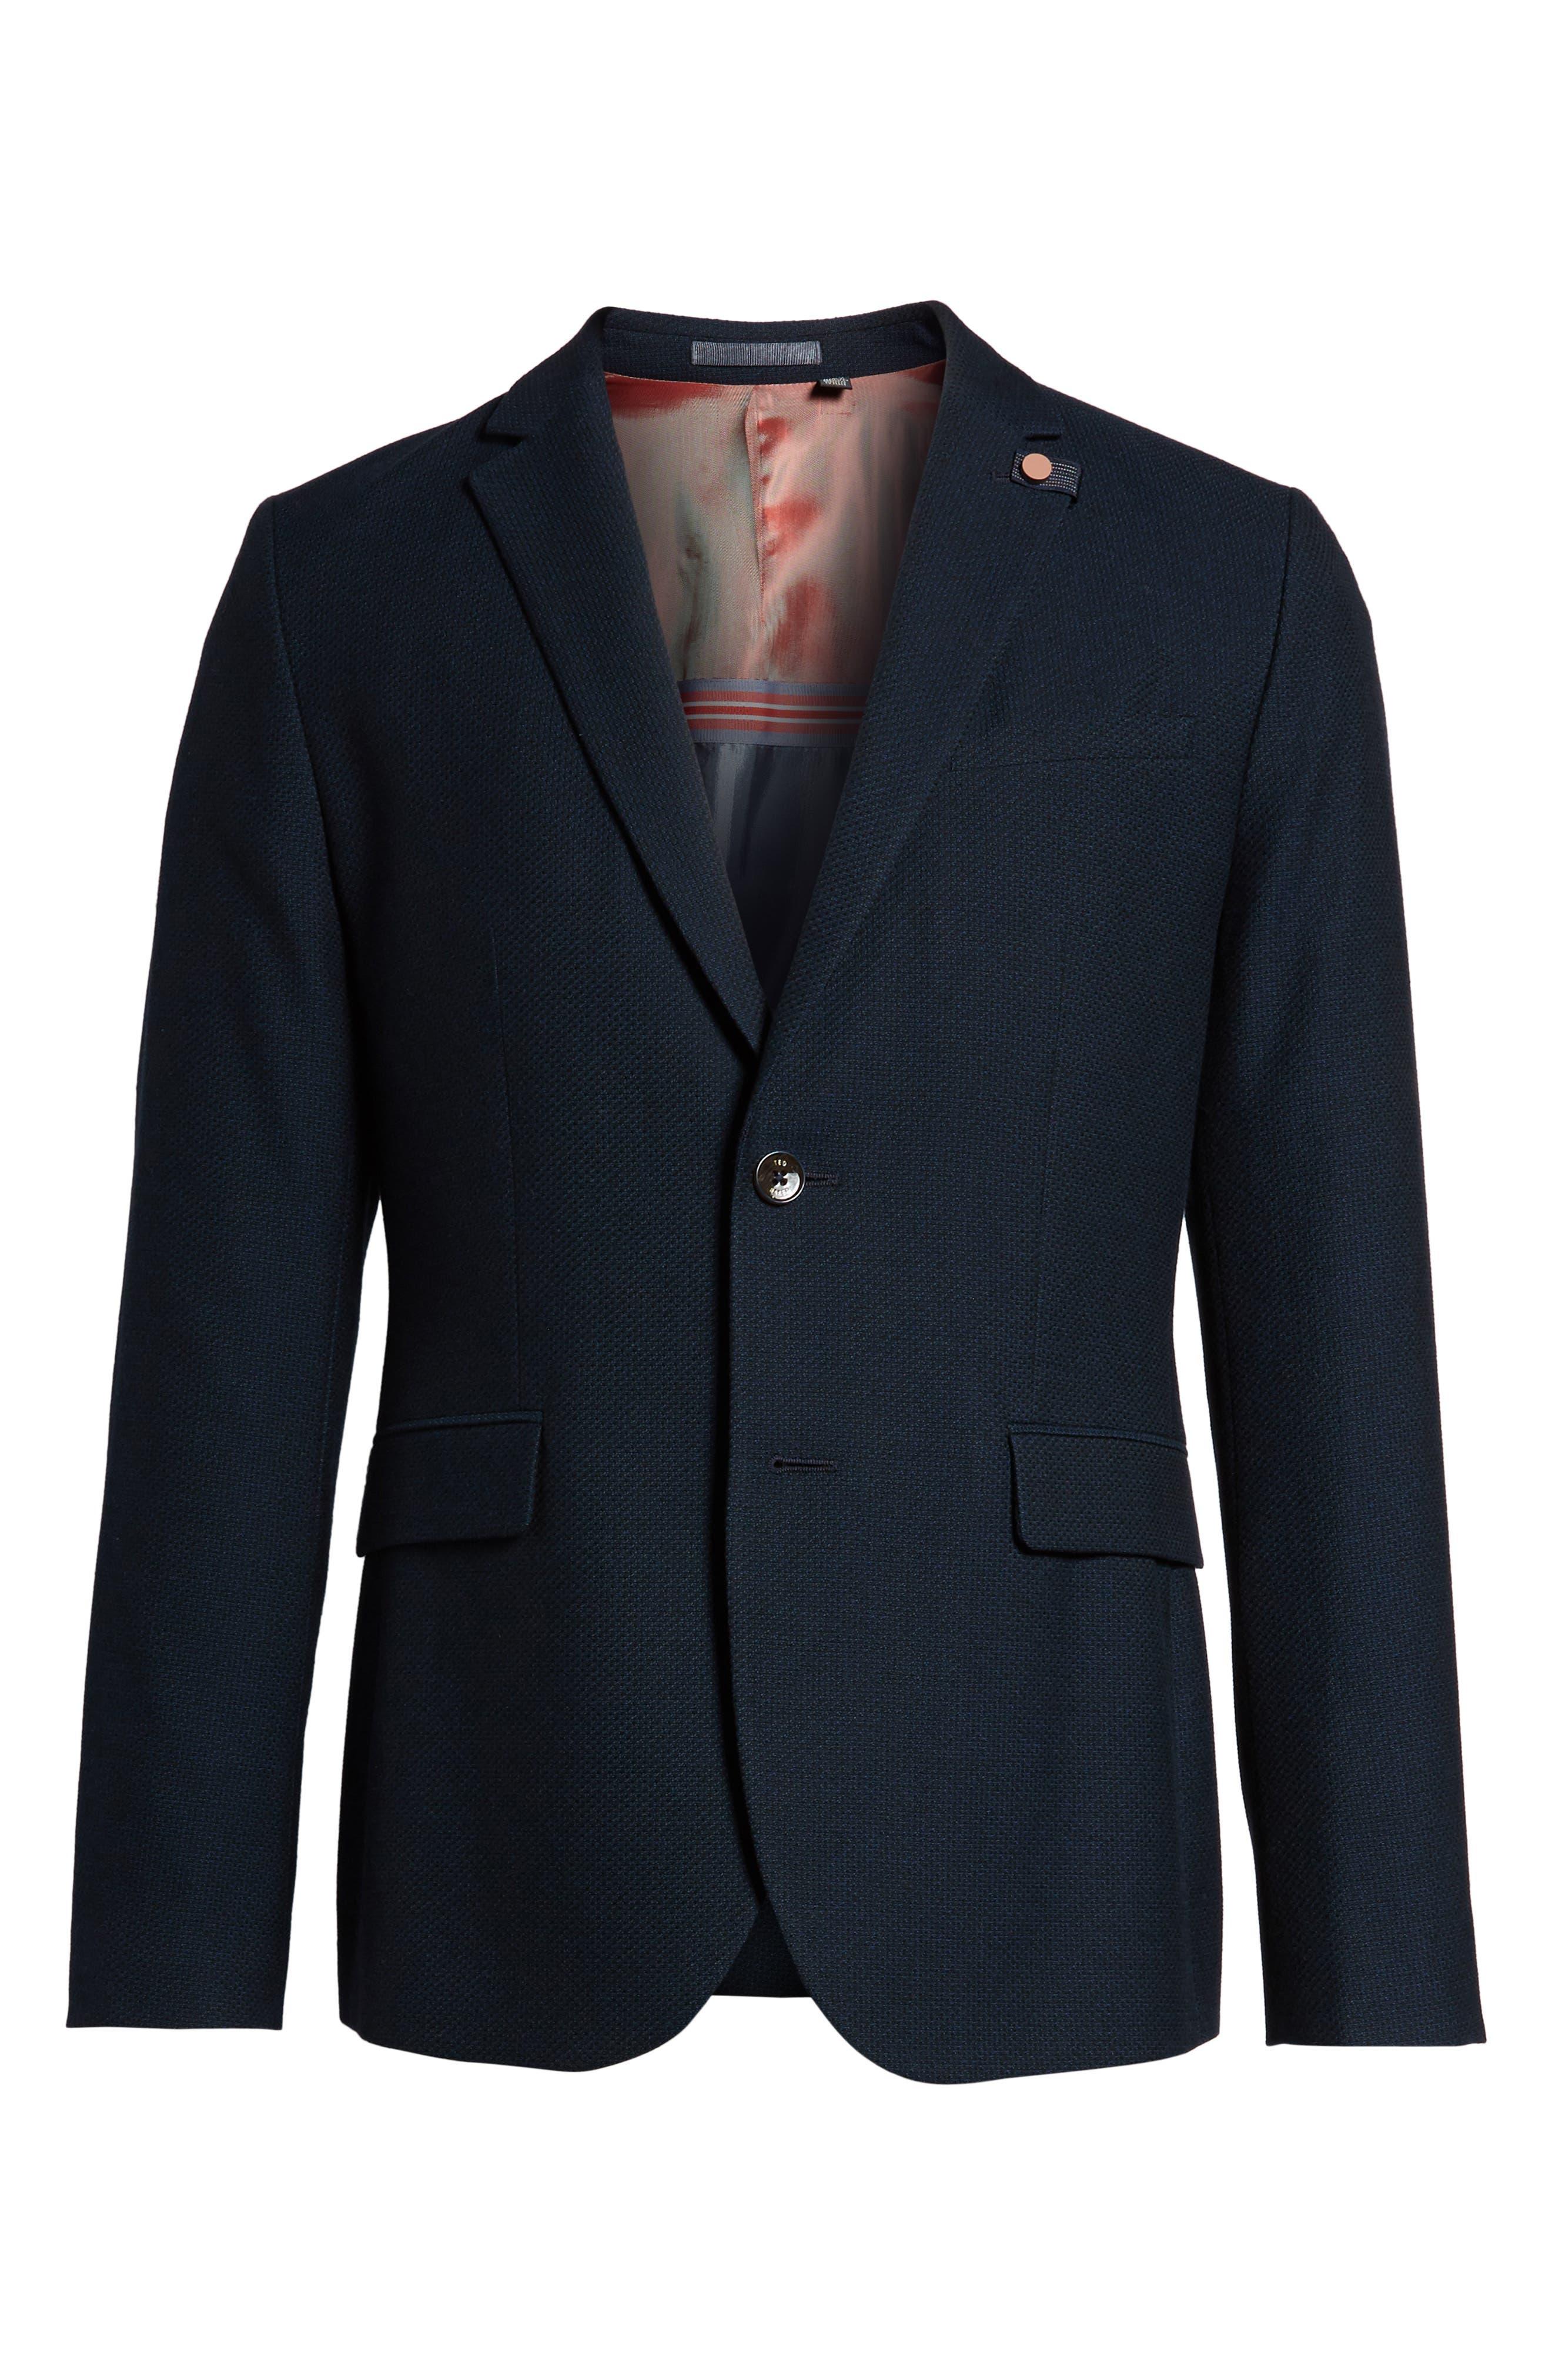 Olsson Textured Sport Coat,                             Alternate thumbnail 6, color,                             Navy